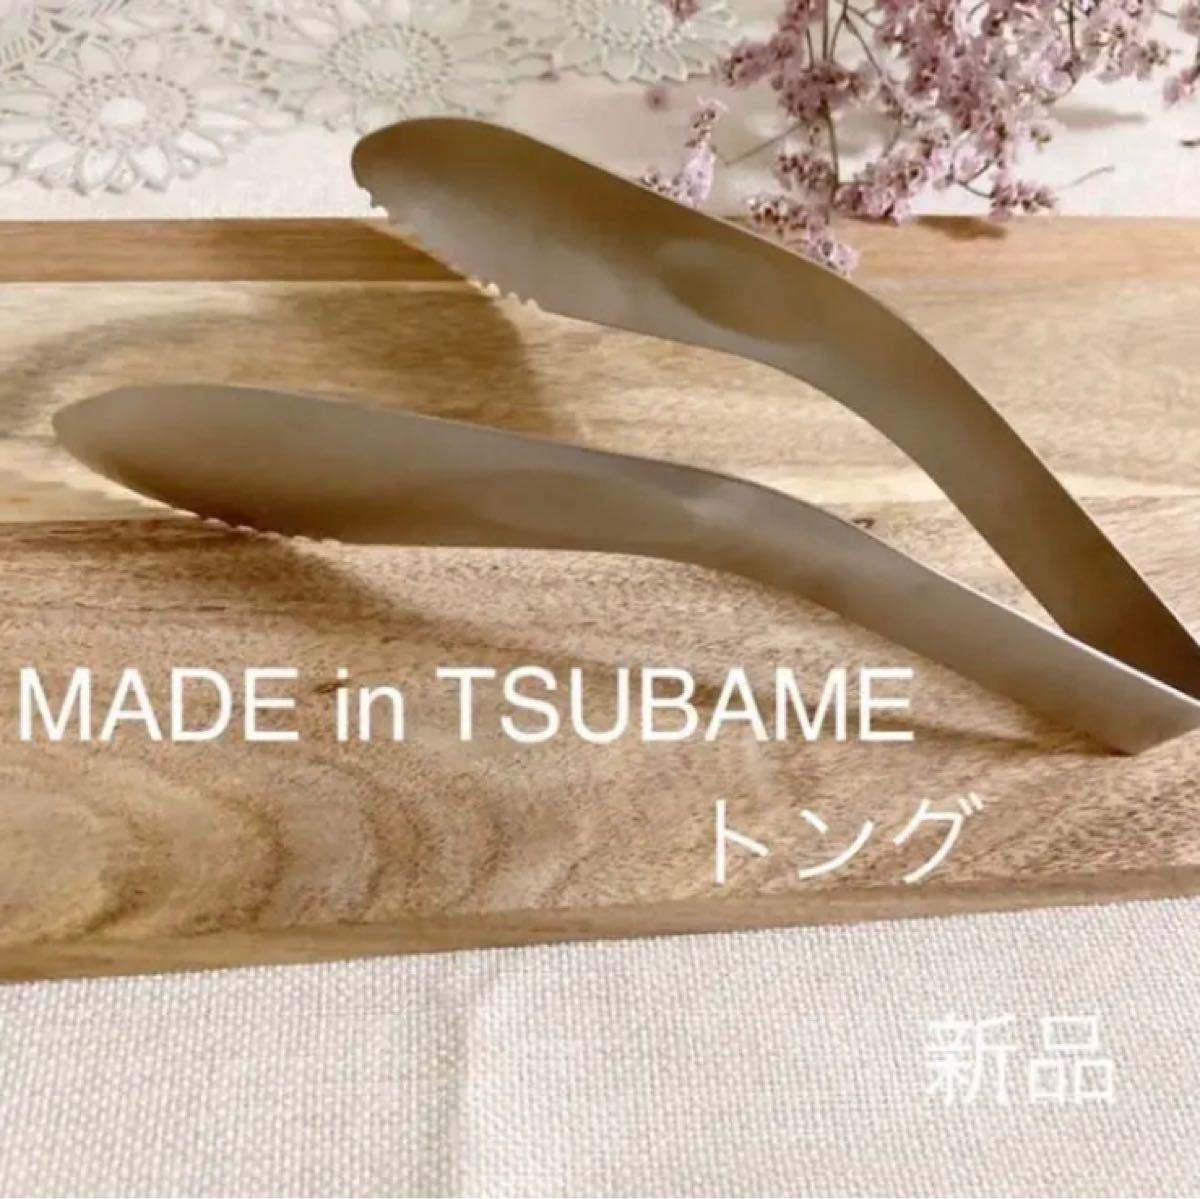 MADE in TSUBAME ステンレストング 新品 日本製 新潟県燕市燕三条 刻印入り 調理器具